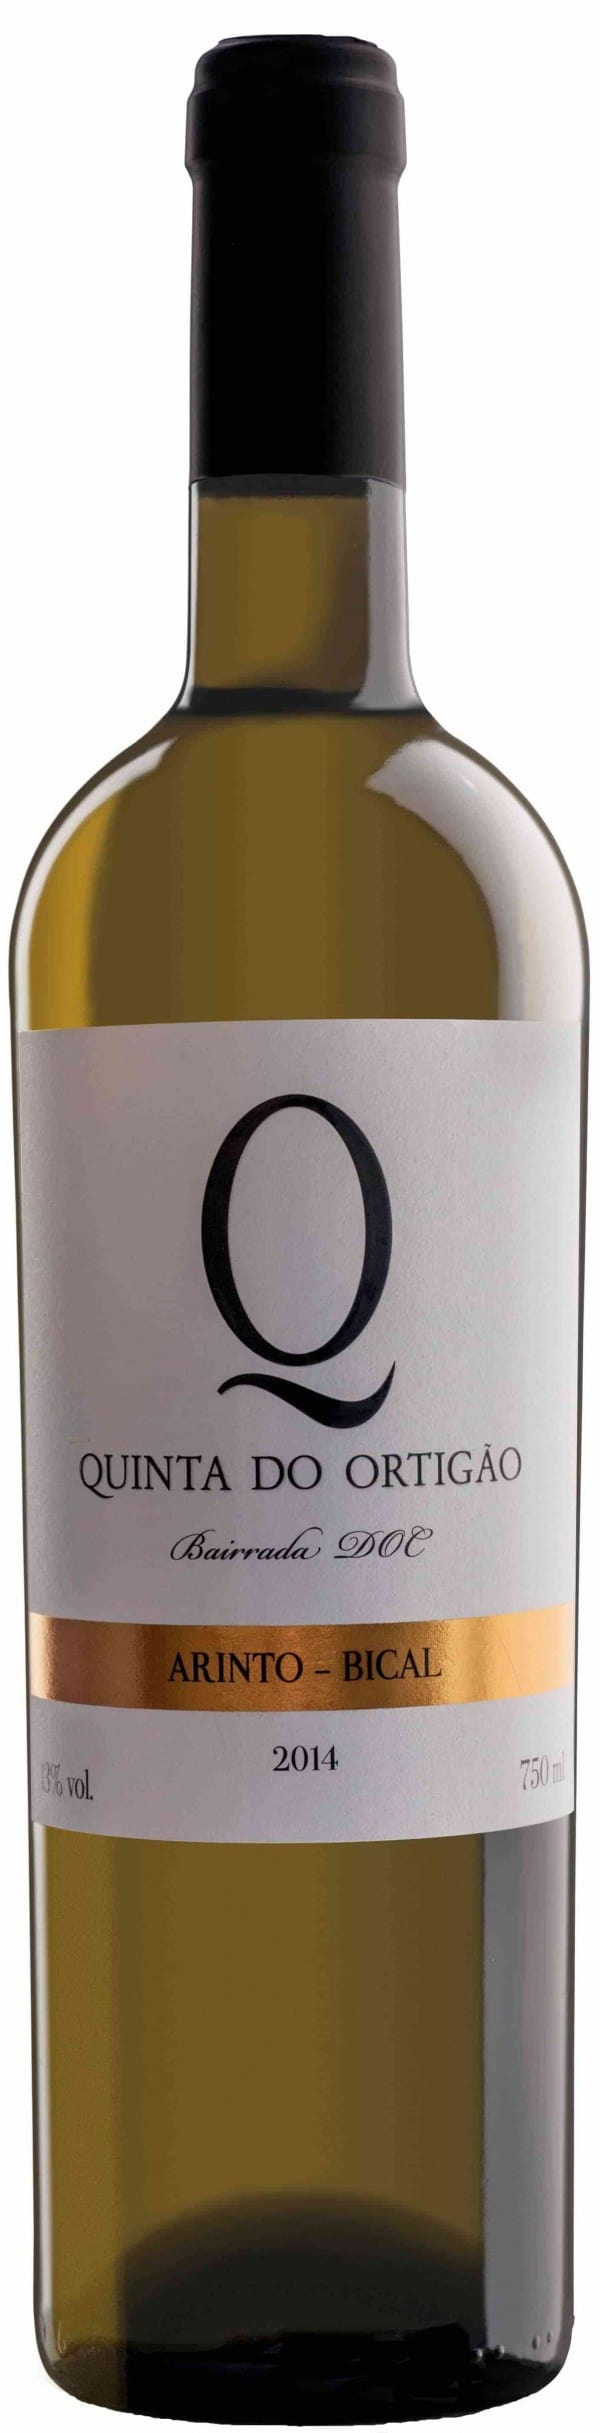 Portugalské víno Quinta do Ortigão Arinto Bical na eshopu vín z Portugalska